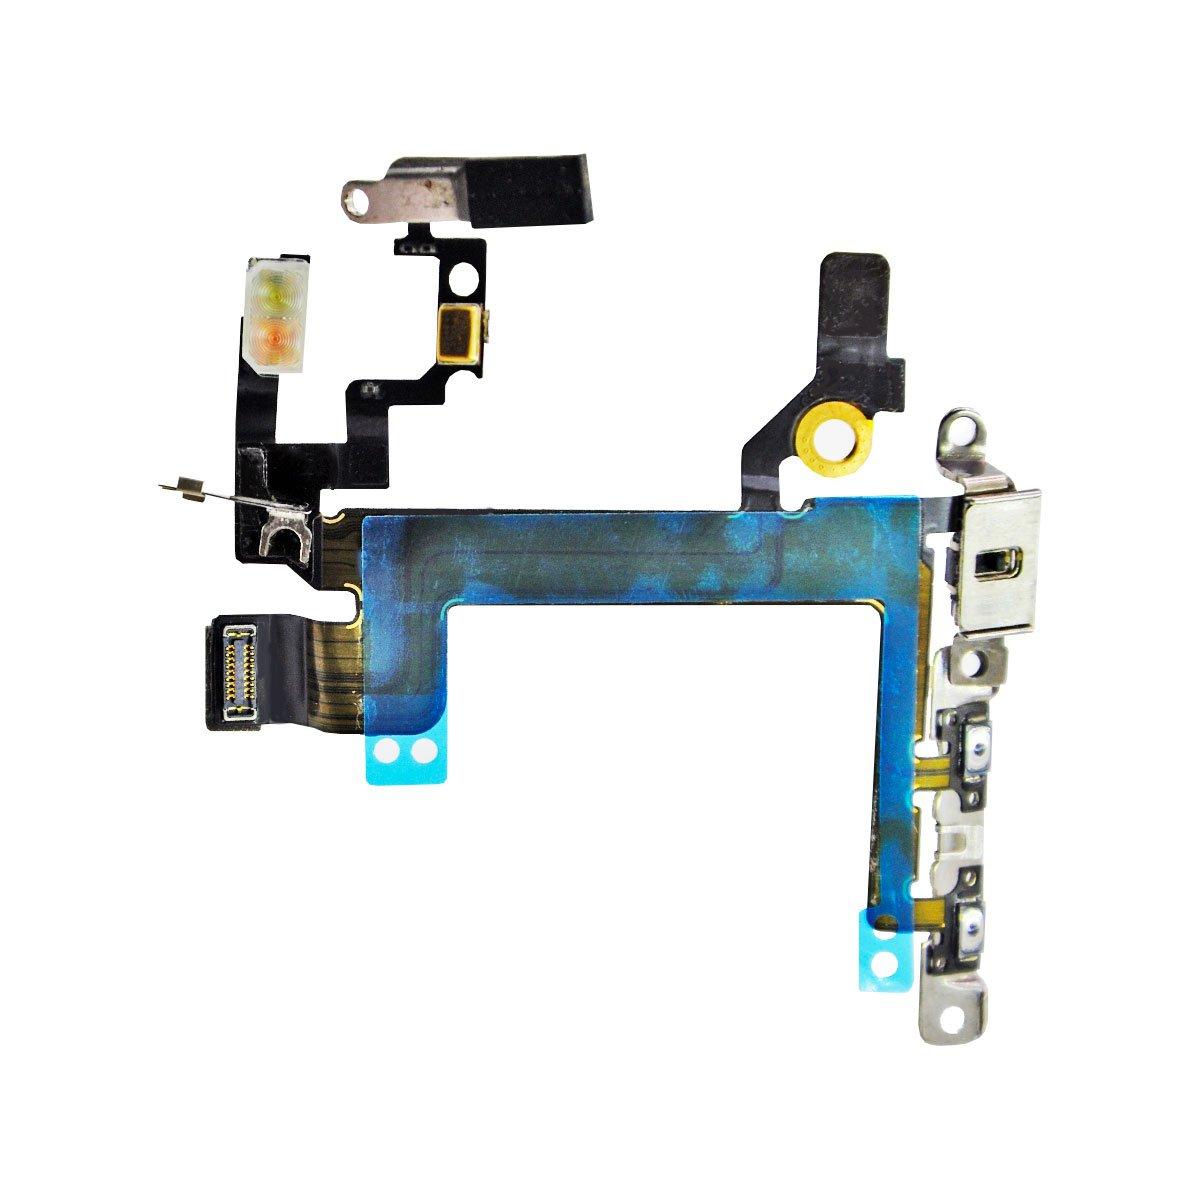 Шлейф для Apple iPhone 5S на кнопку включения/кнопки громкости/микрофон/вспышка